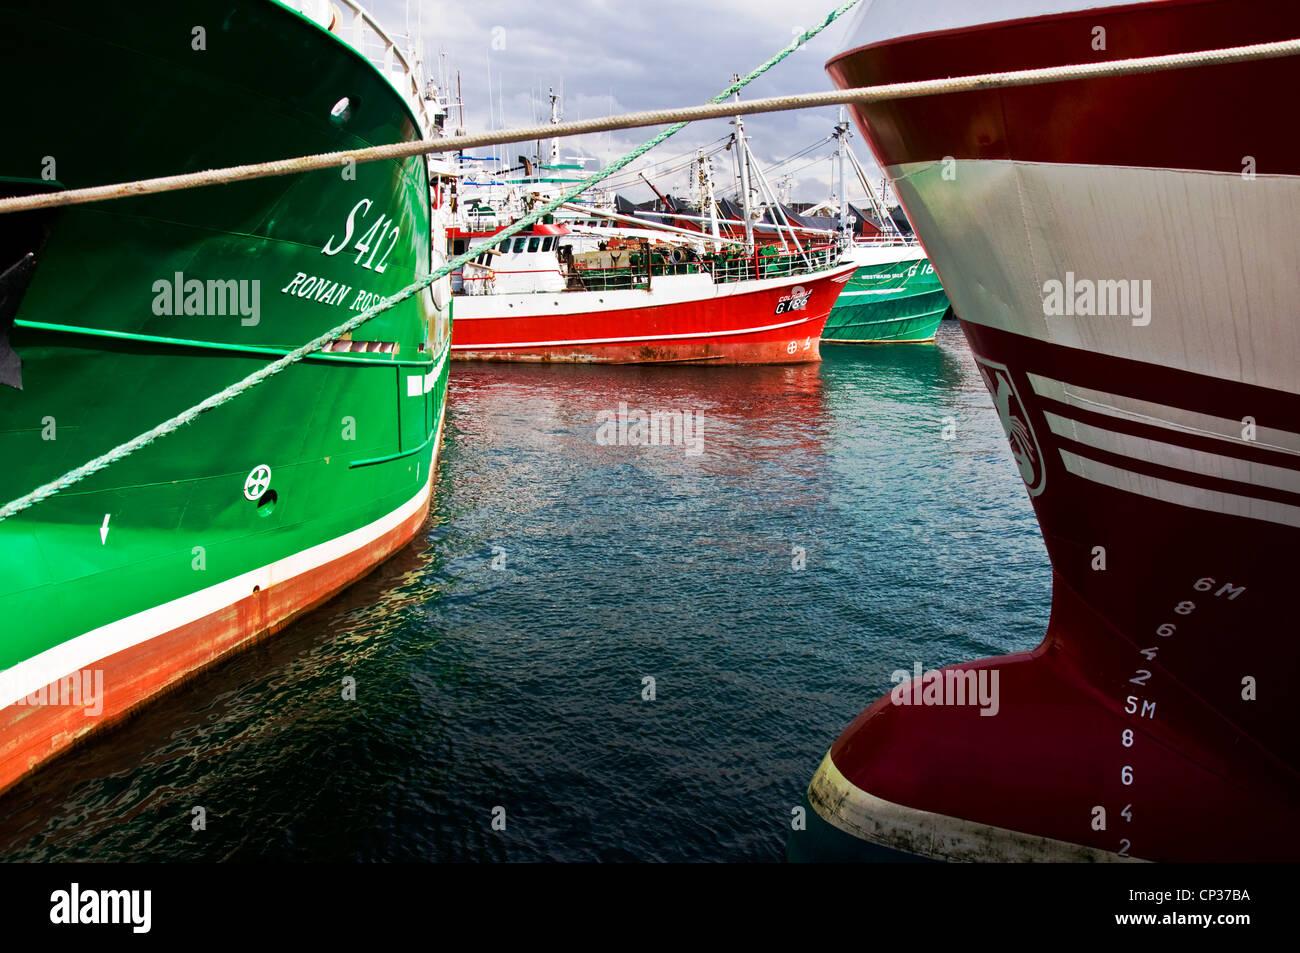 Fishing trawlers in harbour - Stock Image